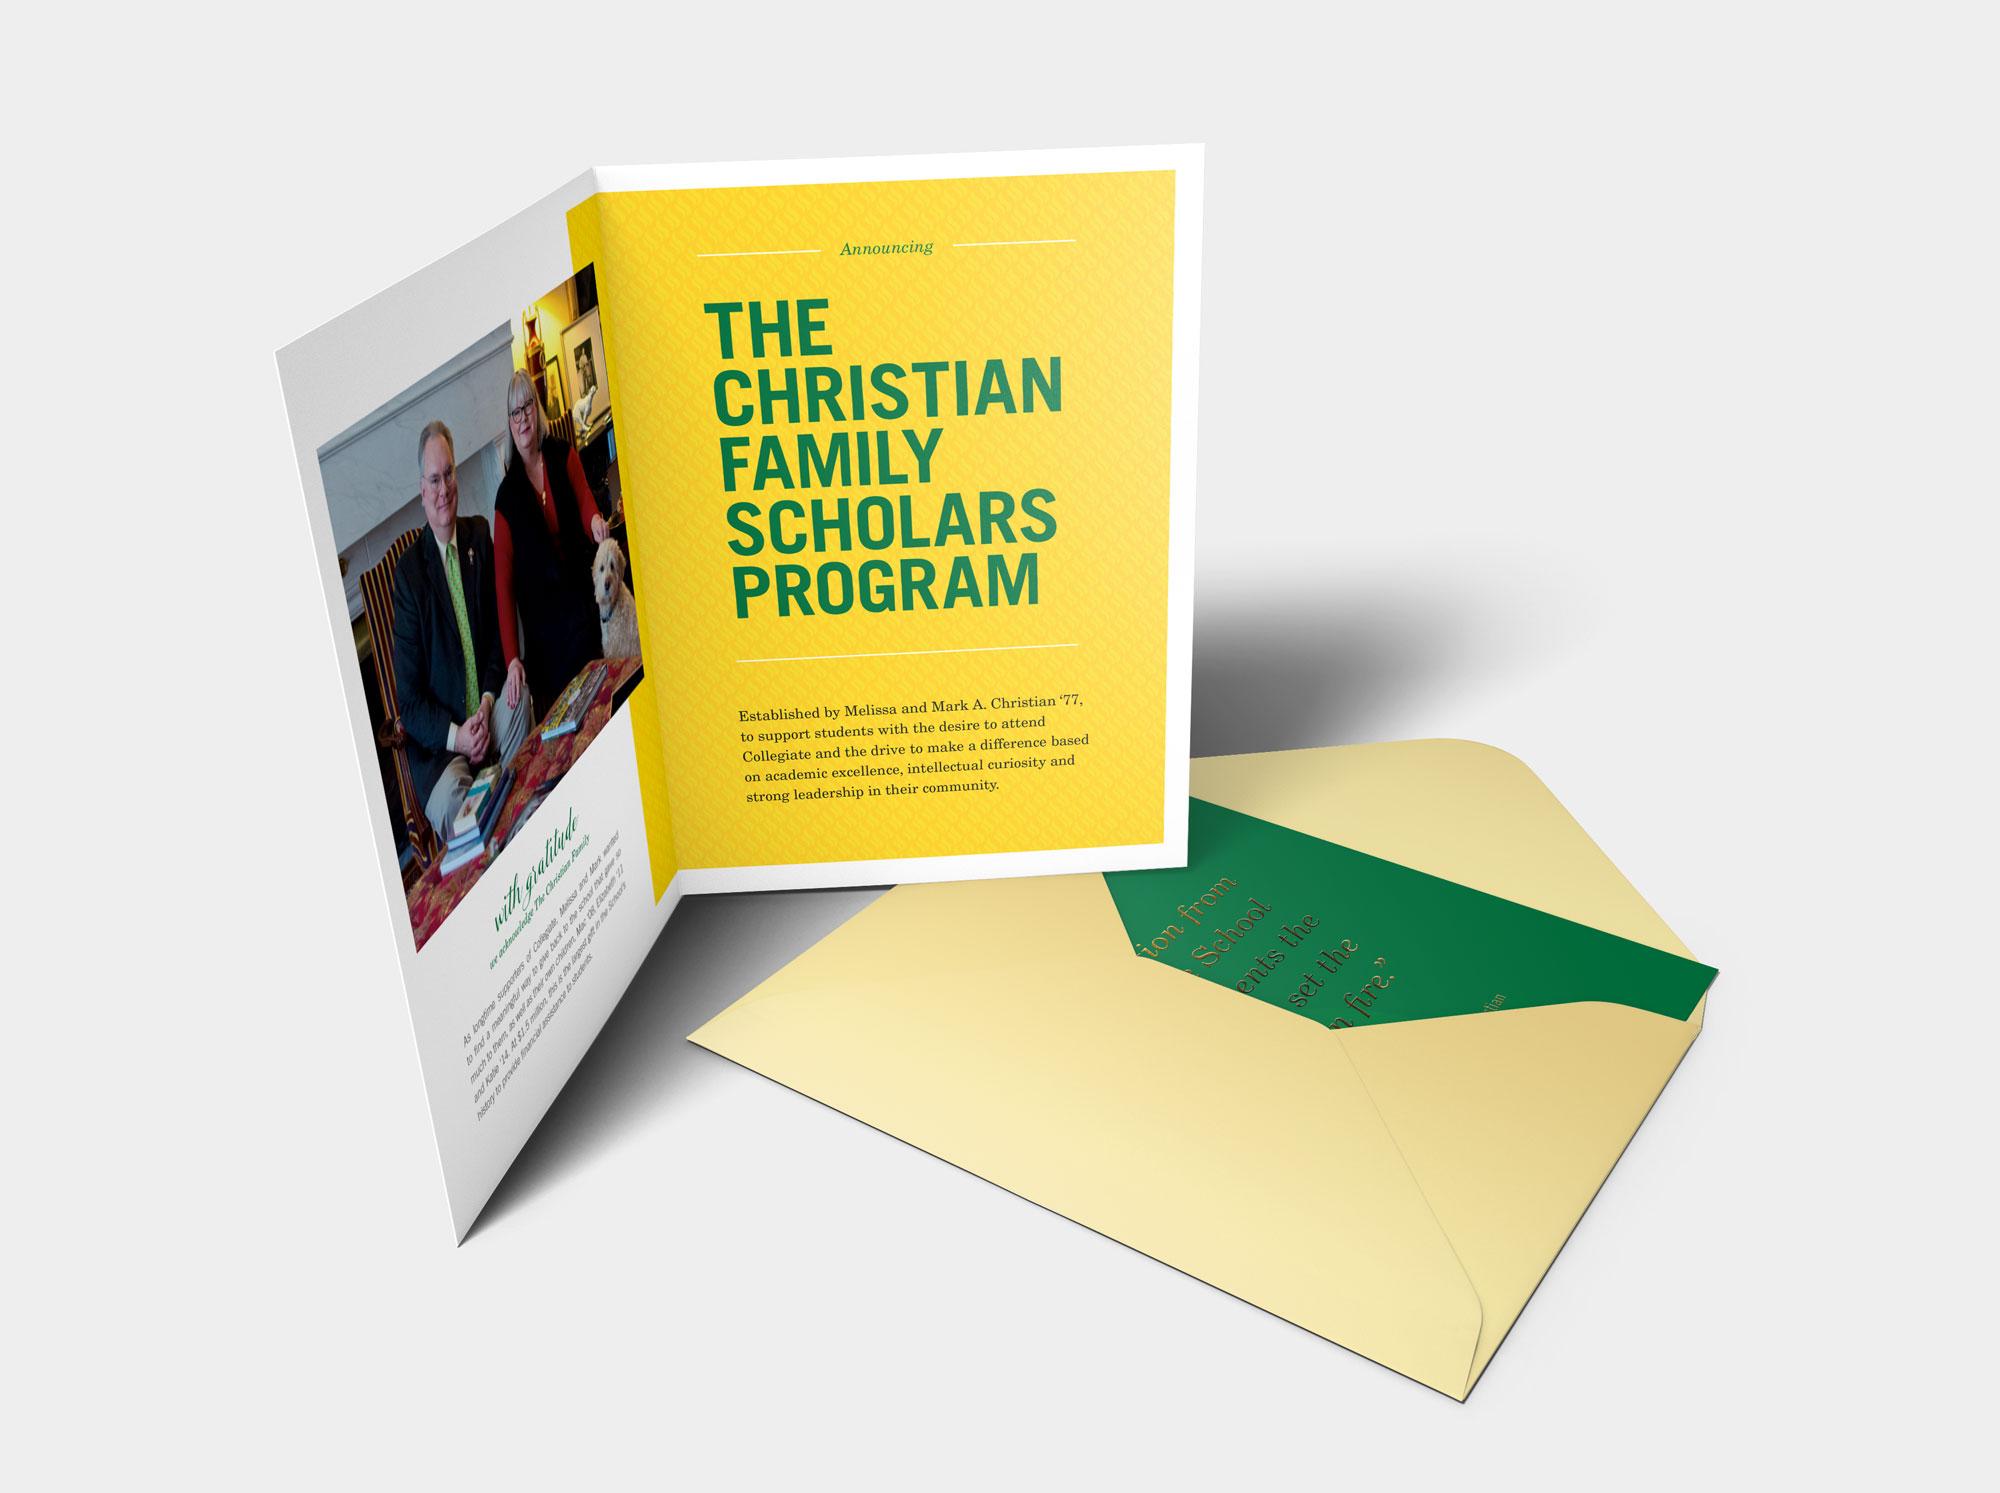 Scholars program announcement